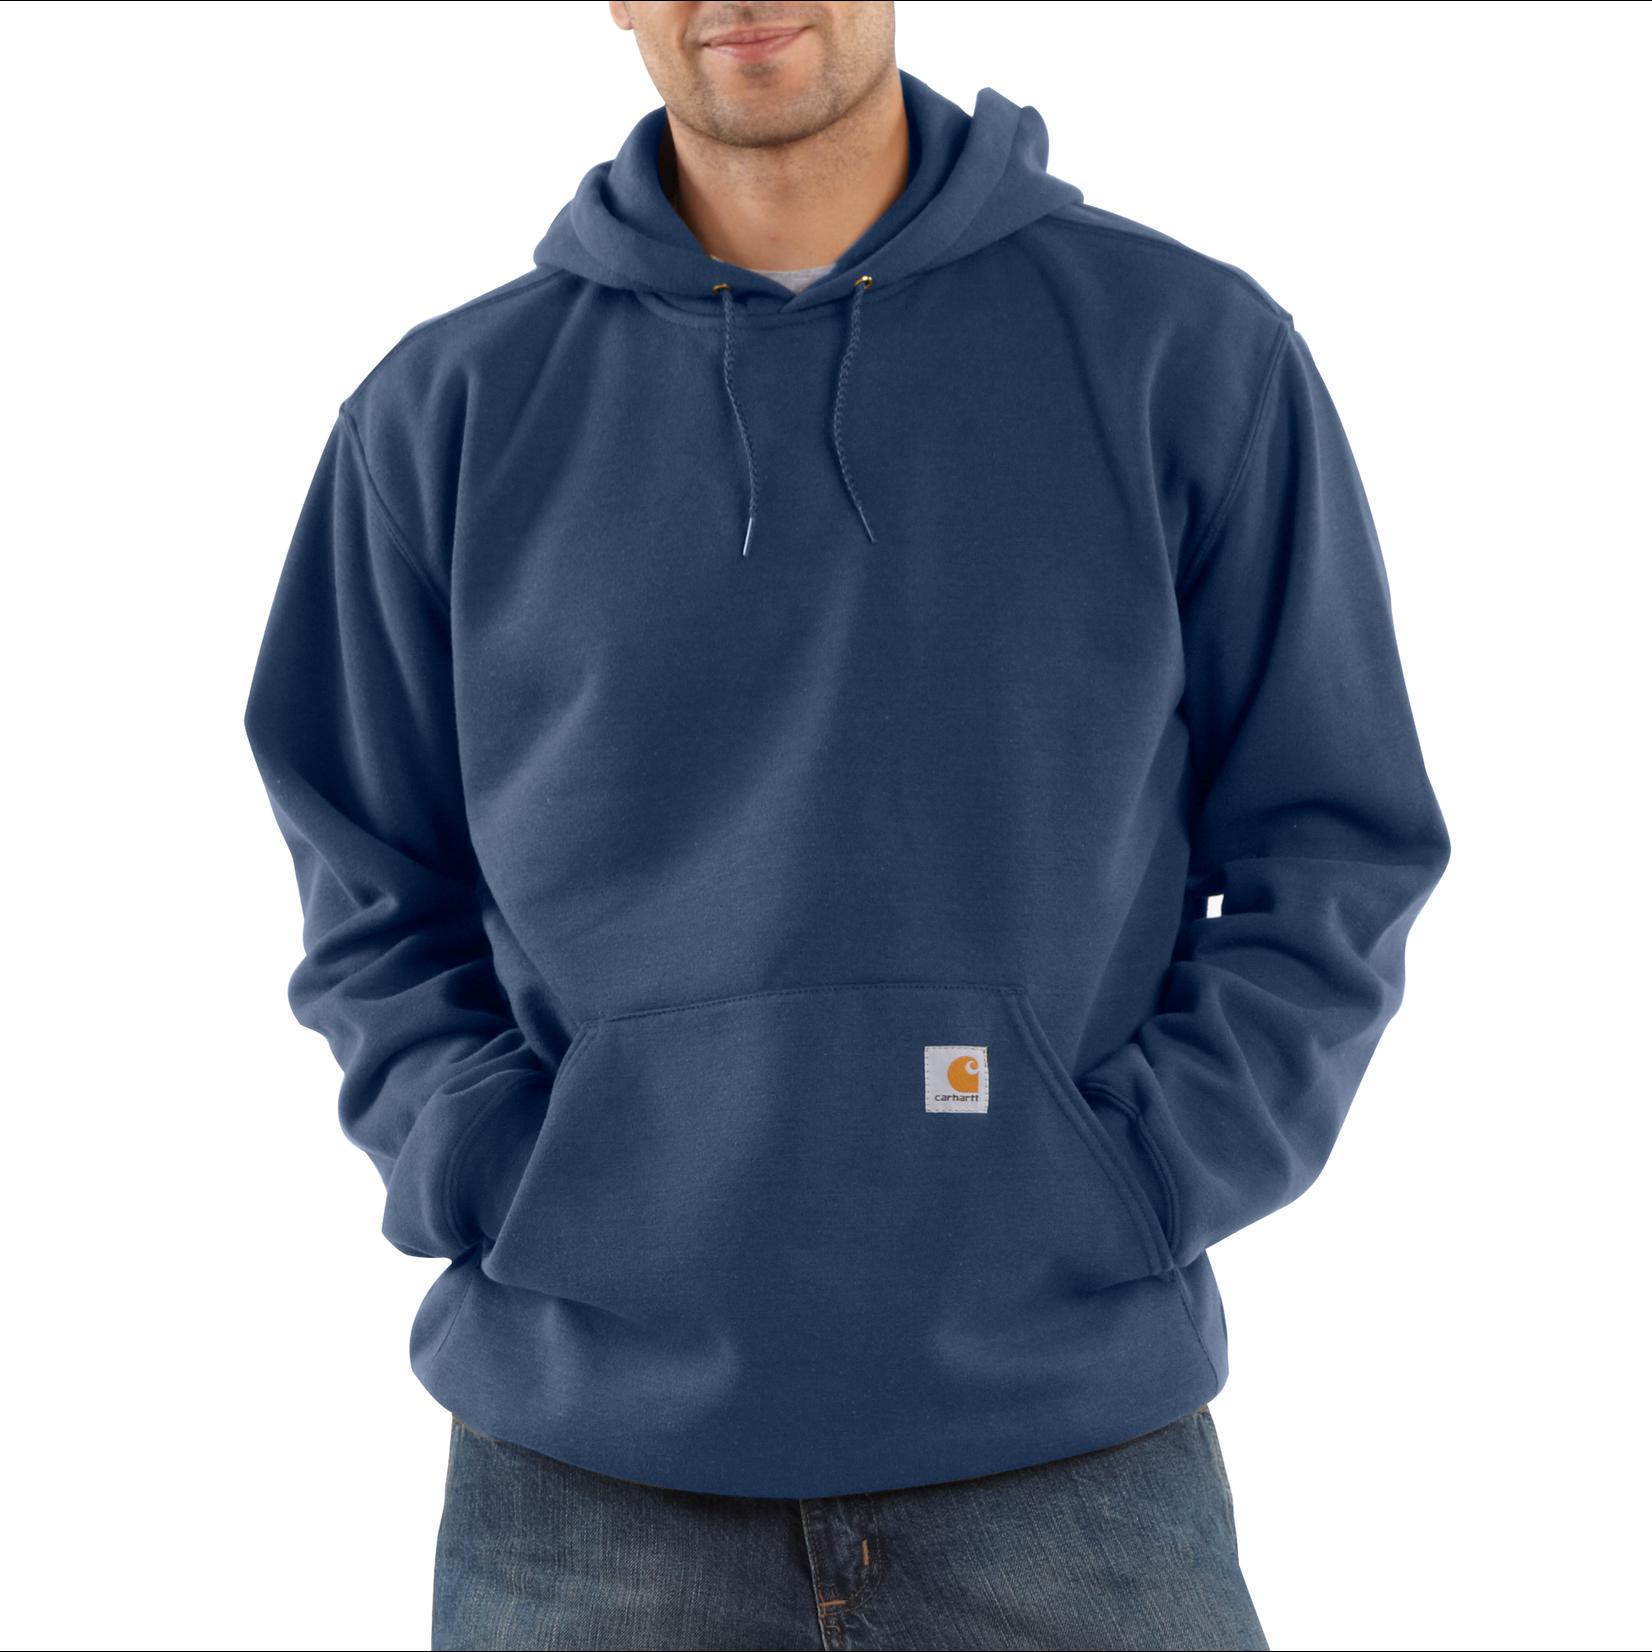 Carhartt Carhartt K121 Loose Fit Midweight Hooded Sweatshirt - 472 New Navy